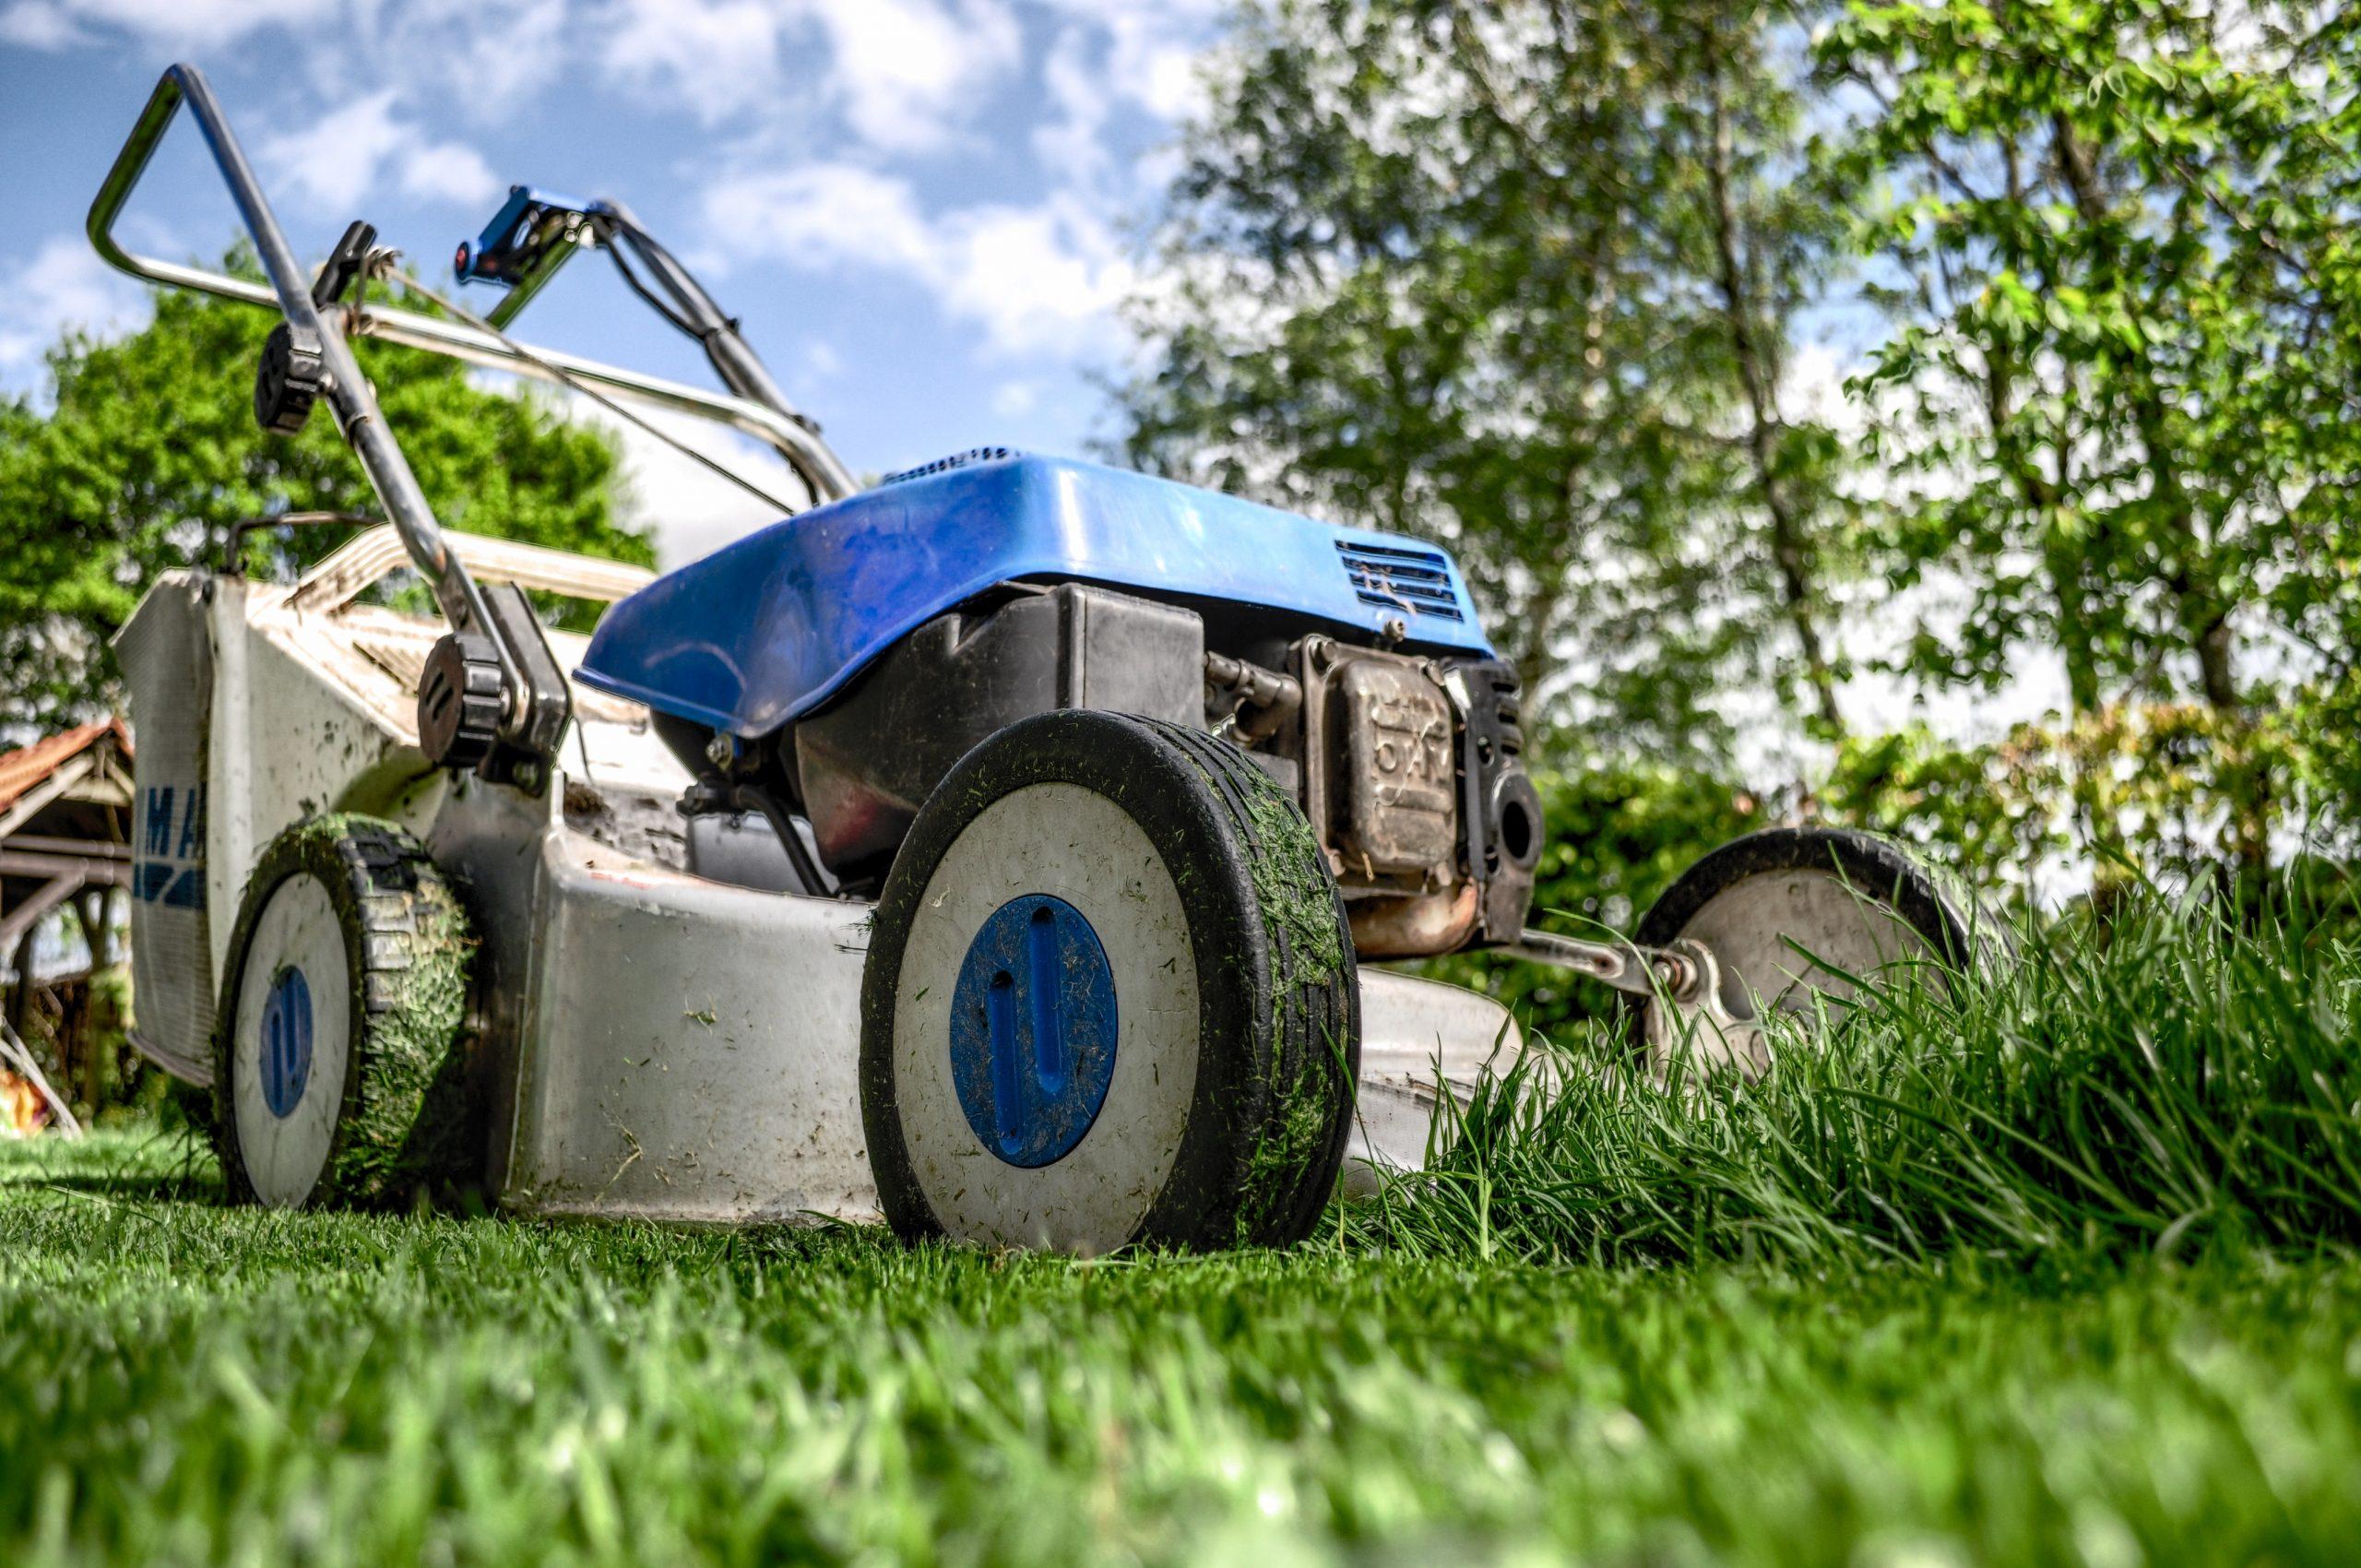 Regular Lawnmower Maintenance - Osburn Home Services - Paint Covered Overalls - Durham North Carolina